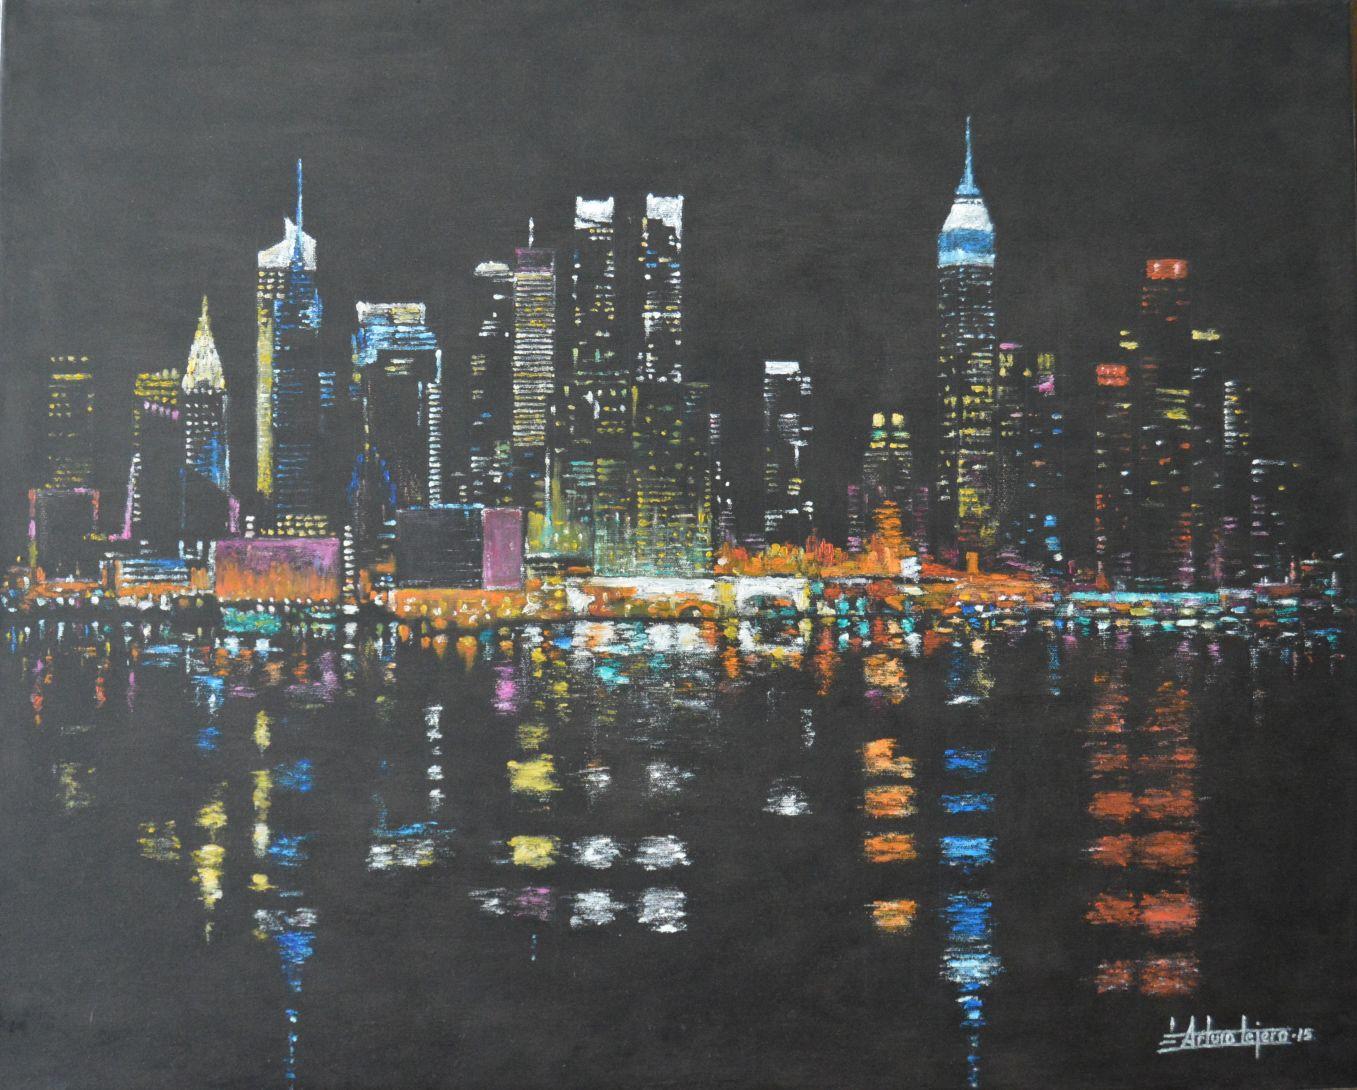 Reflejos de New York (2015) - Arturo Tejero Esteban